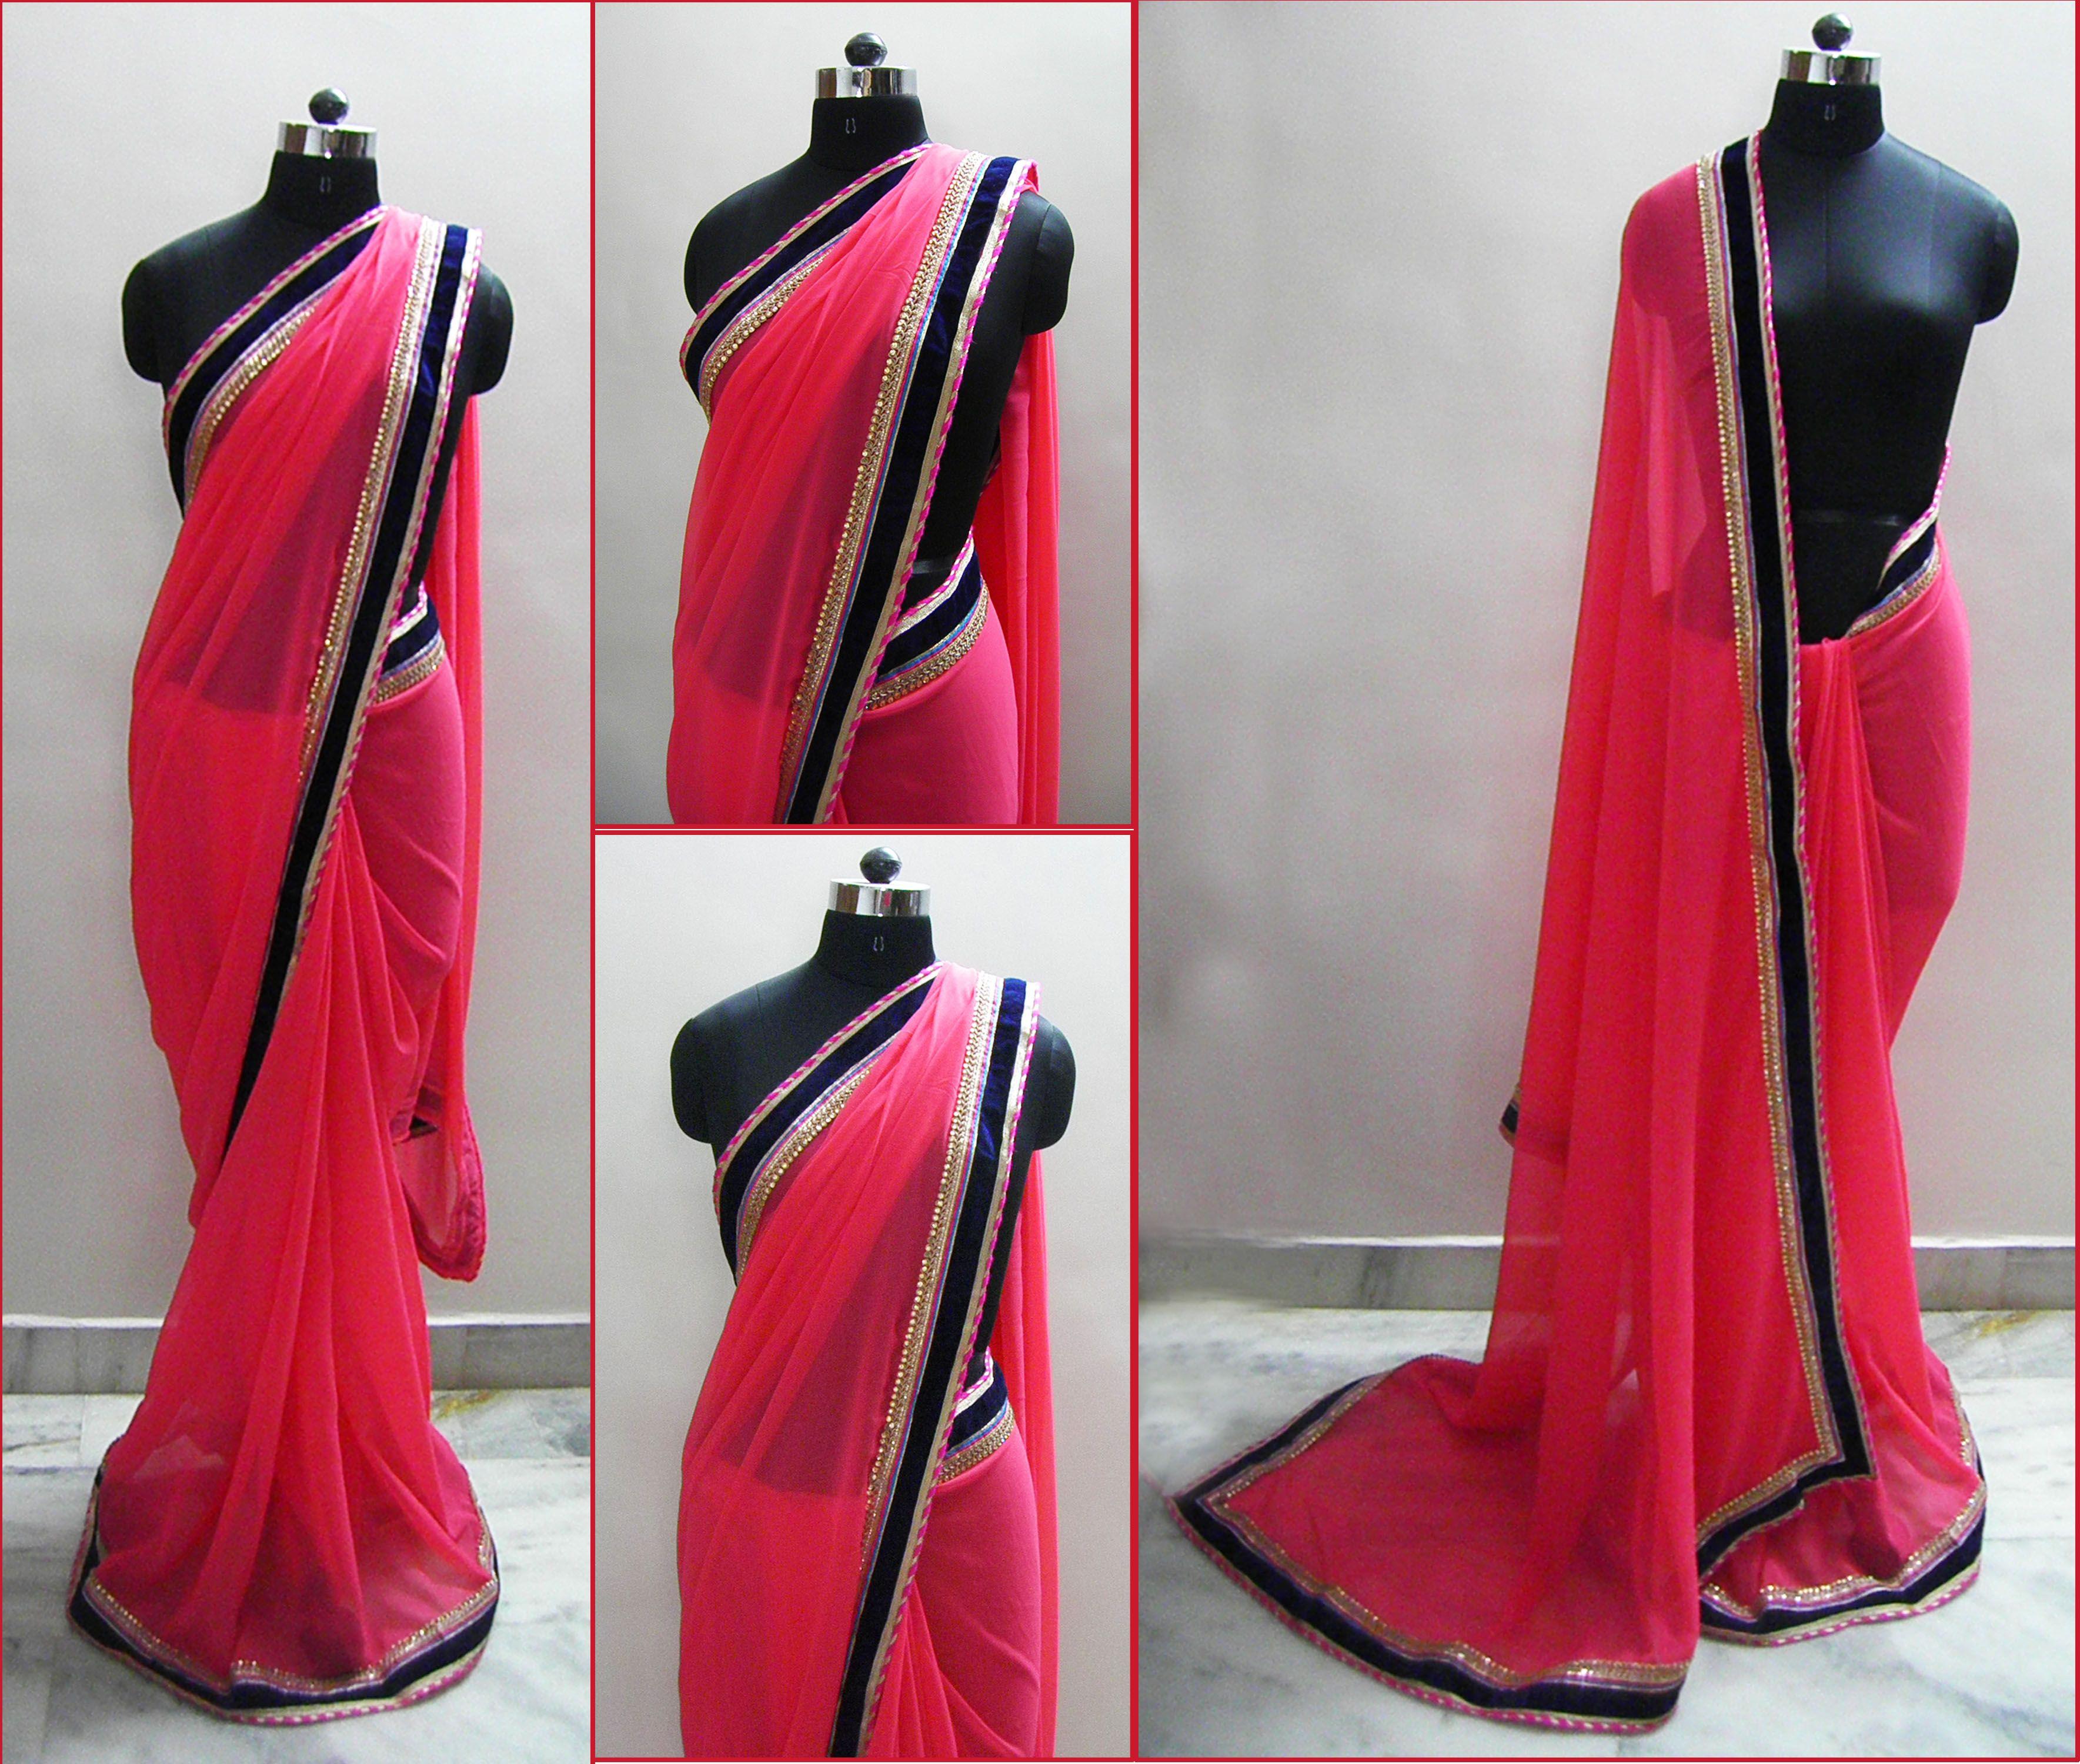 Georgette Fabric, Pink And Gold, Carrot, Blue Velvet, Design Studios, Royal  Blue, Saris, Blouse, Carrots